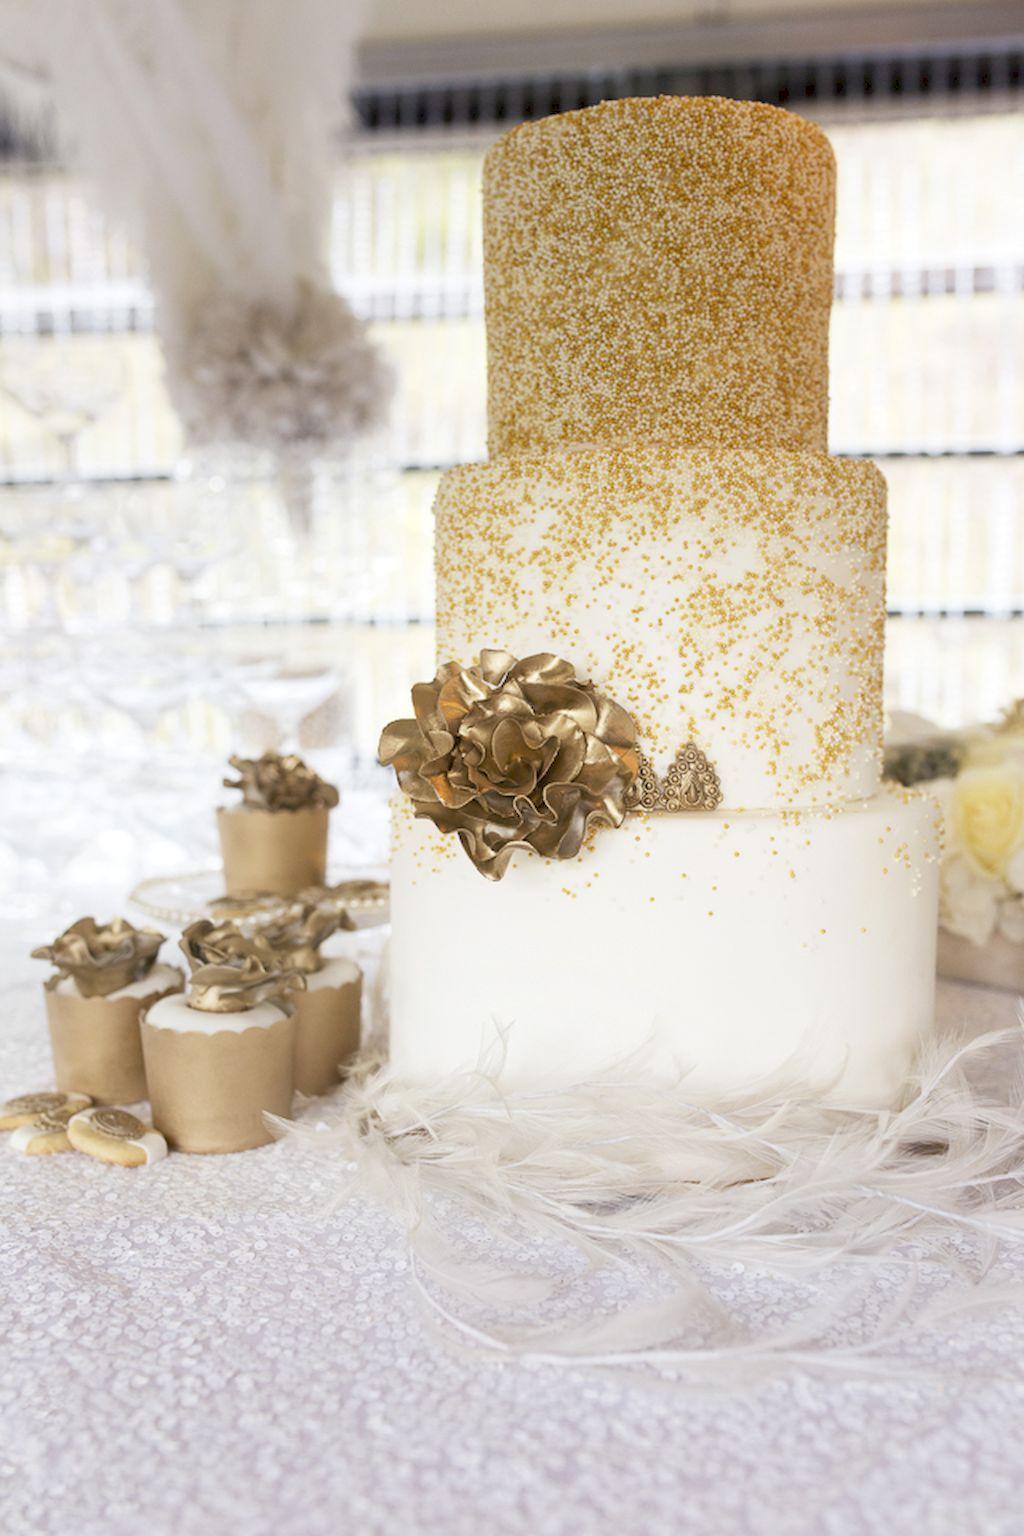 88 Luxurious Glitter Wedding Theme Ideas | Theme ideas and Weddings